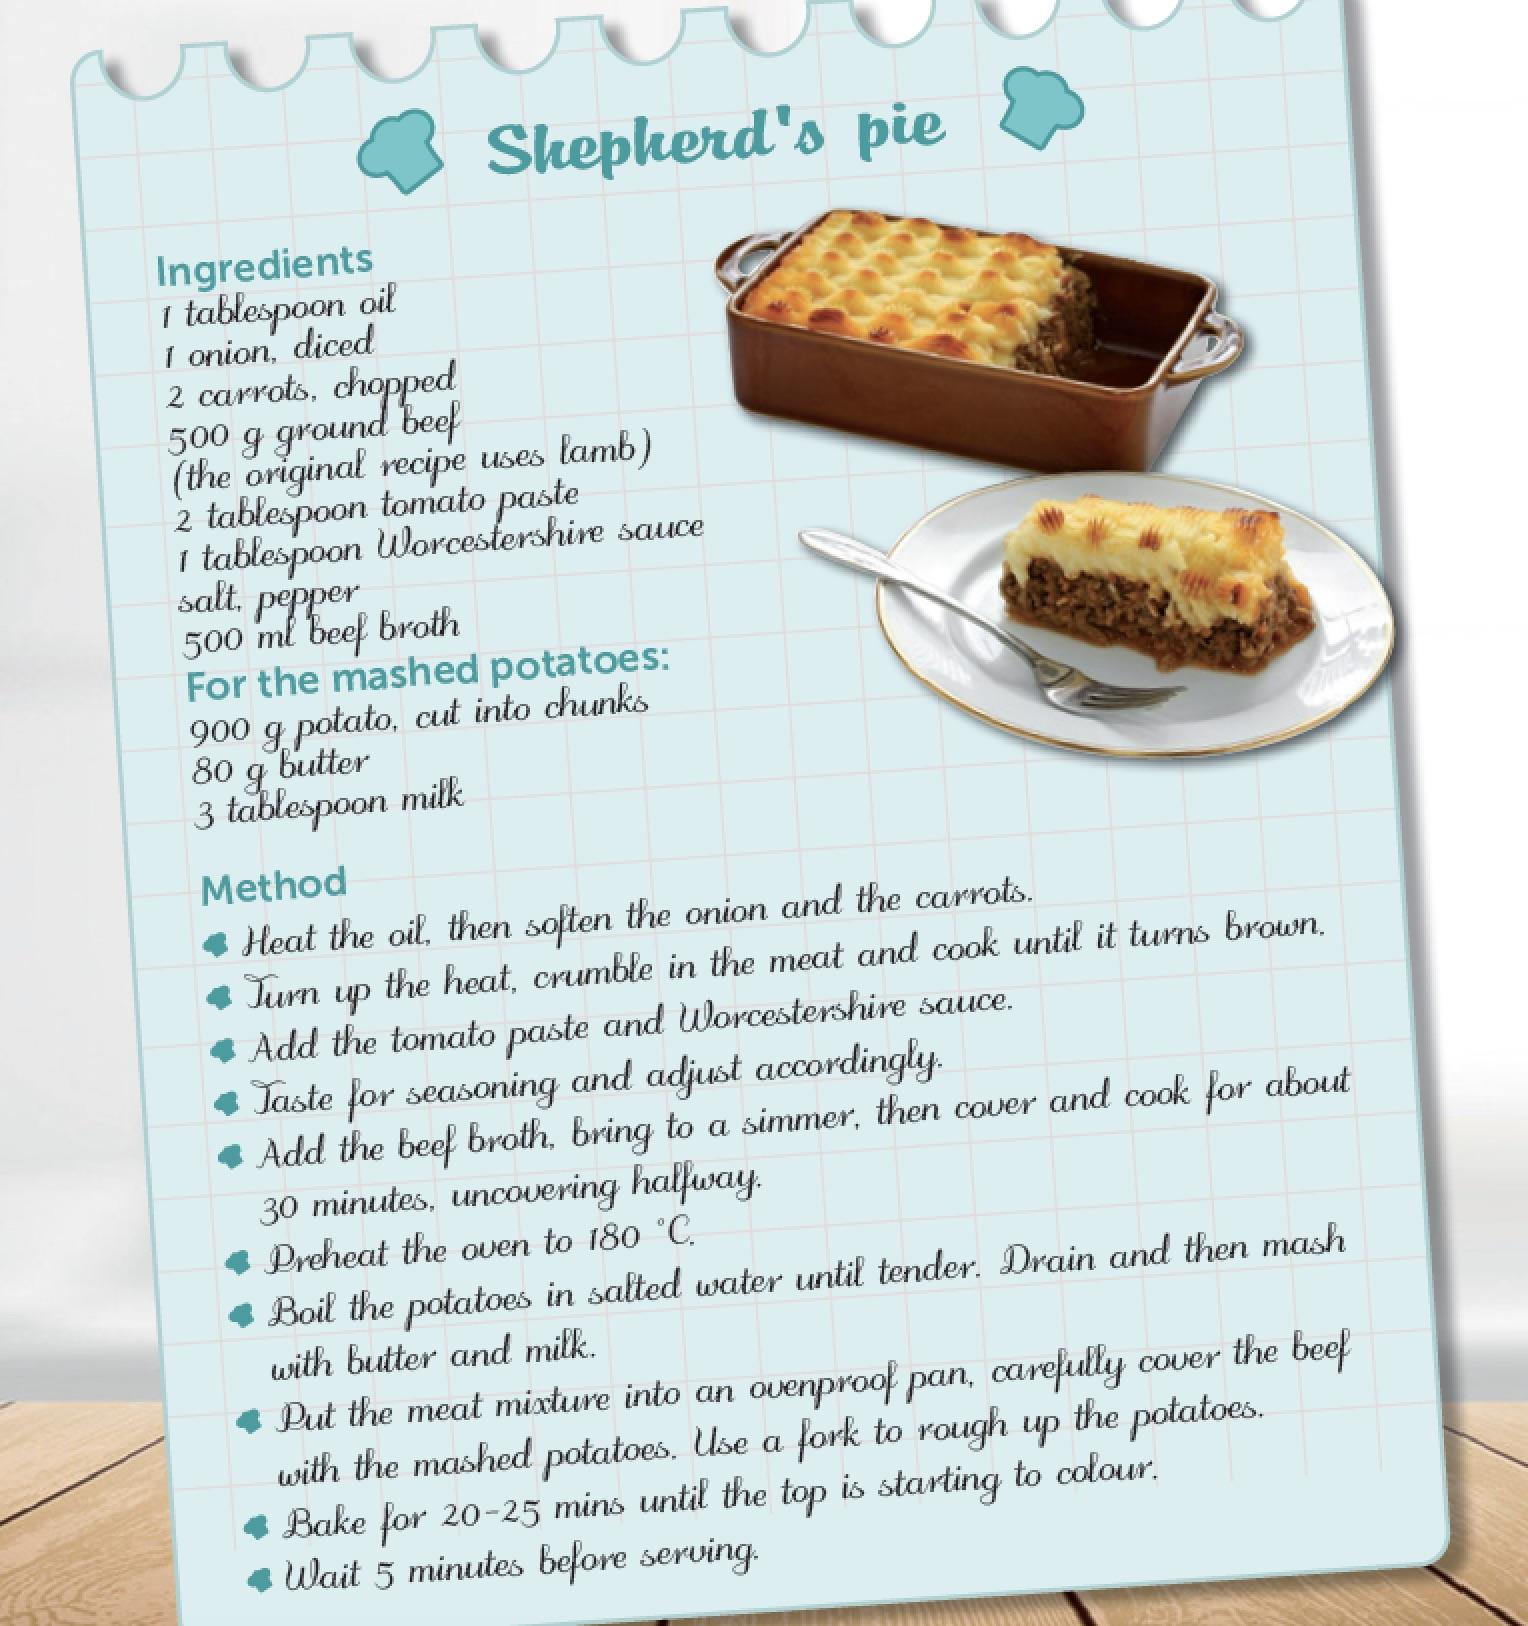 Ricetta In Inglese Traduzione.Recipe Shepherd S Pie Speakup Blog